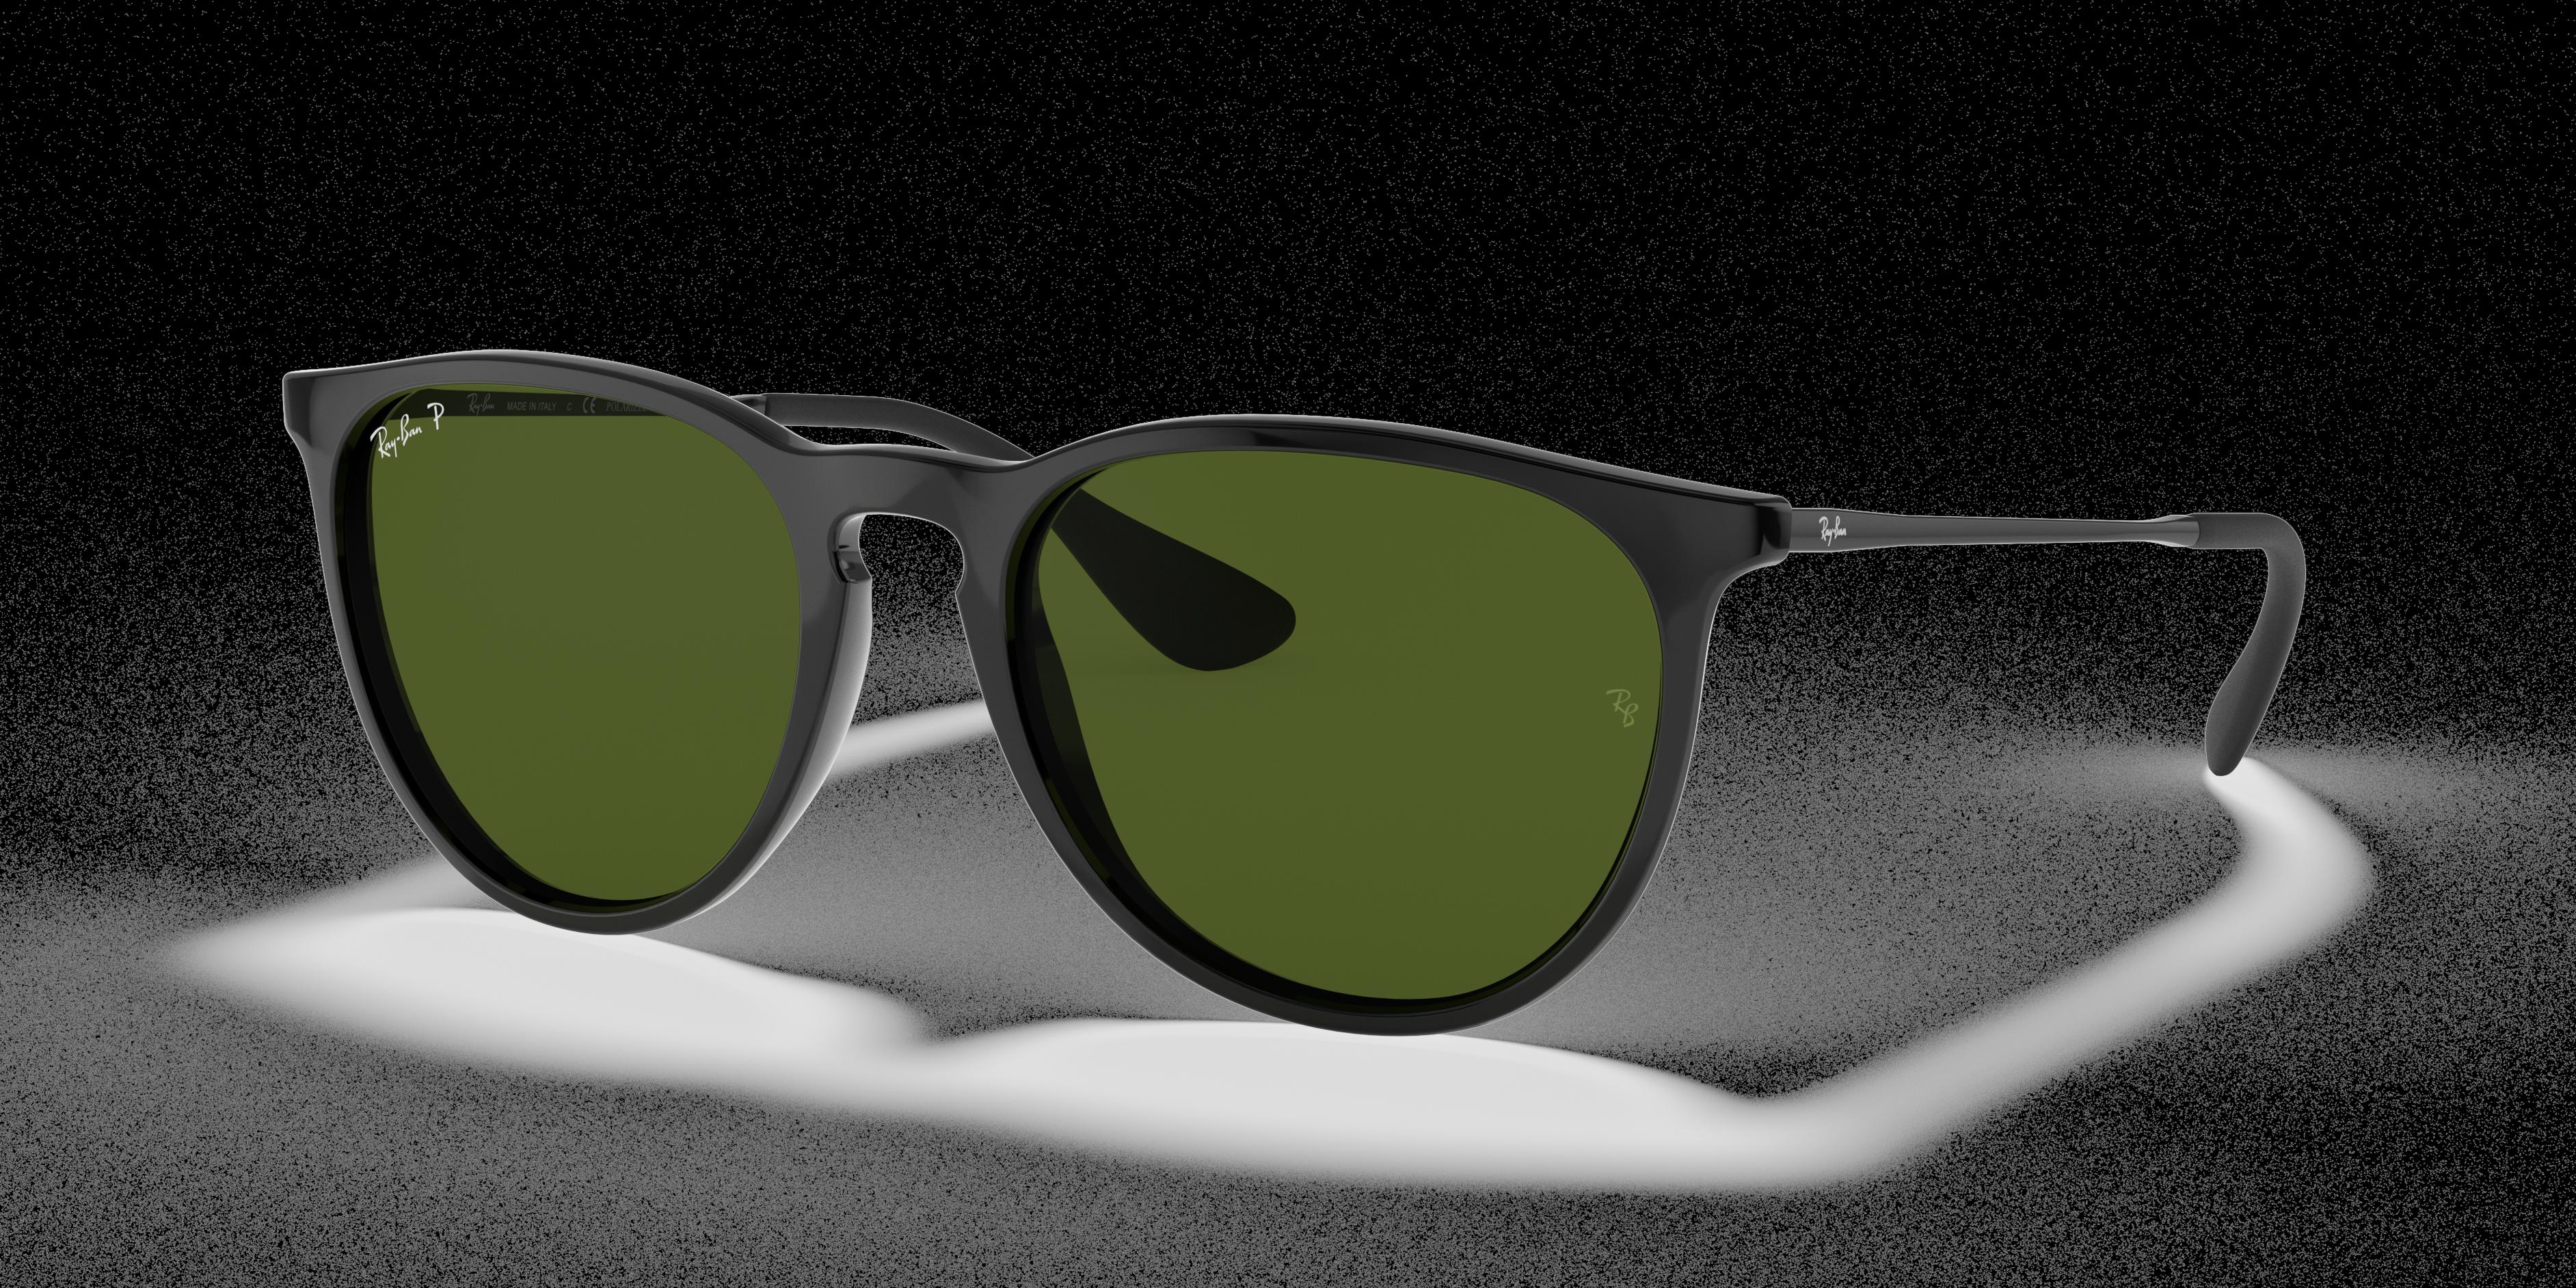 Ray-Ban Erika Classic Black, Polarized Green Lenses - RB4171